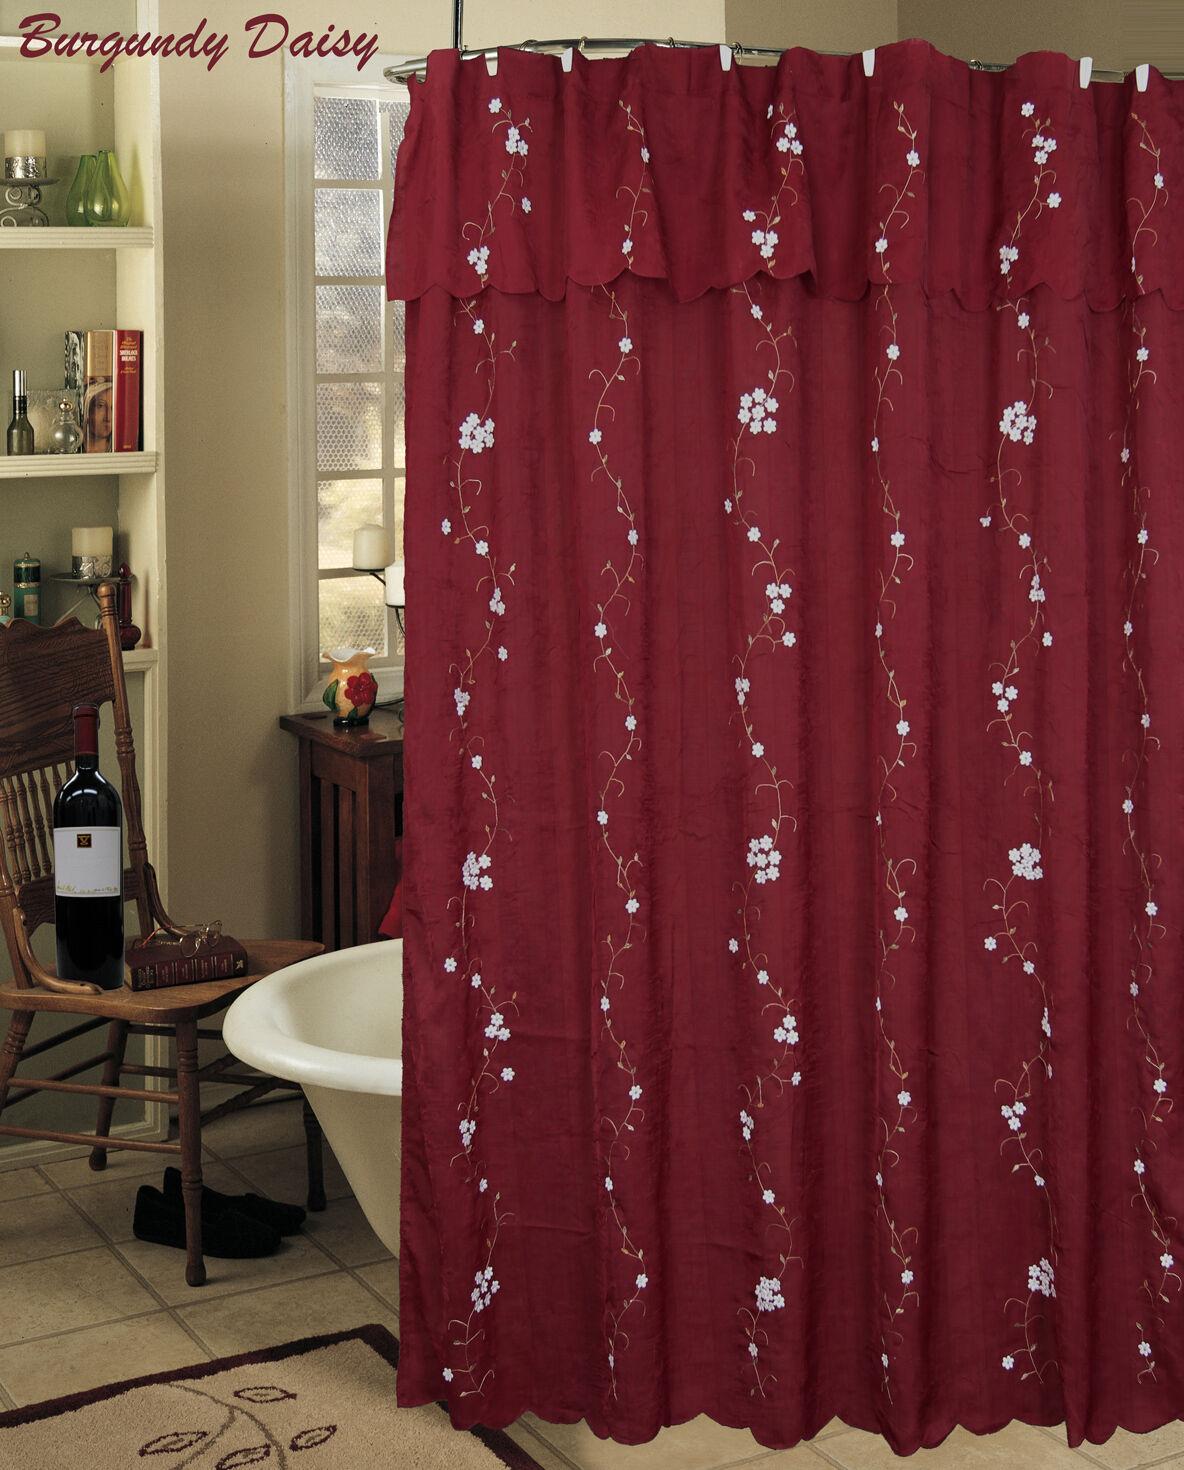 Daisy Embroidery 3d Fabric Shower Curtain Creative Linens S&h ...